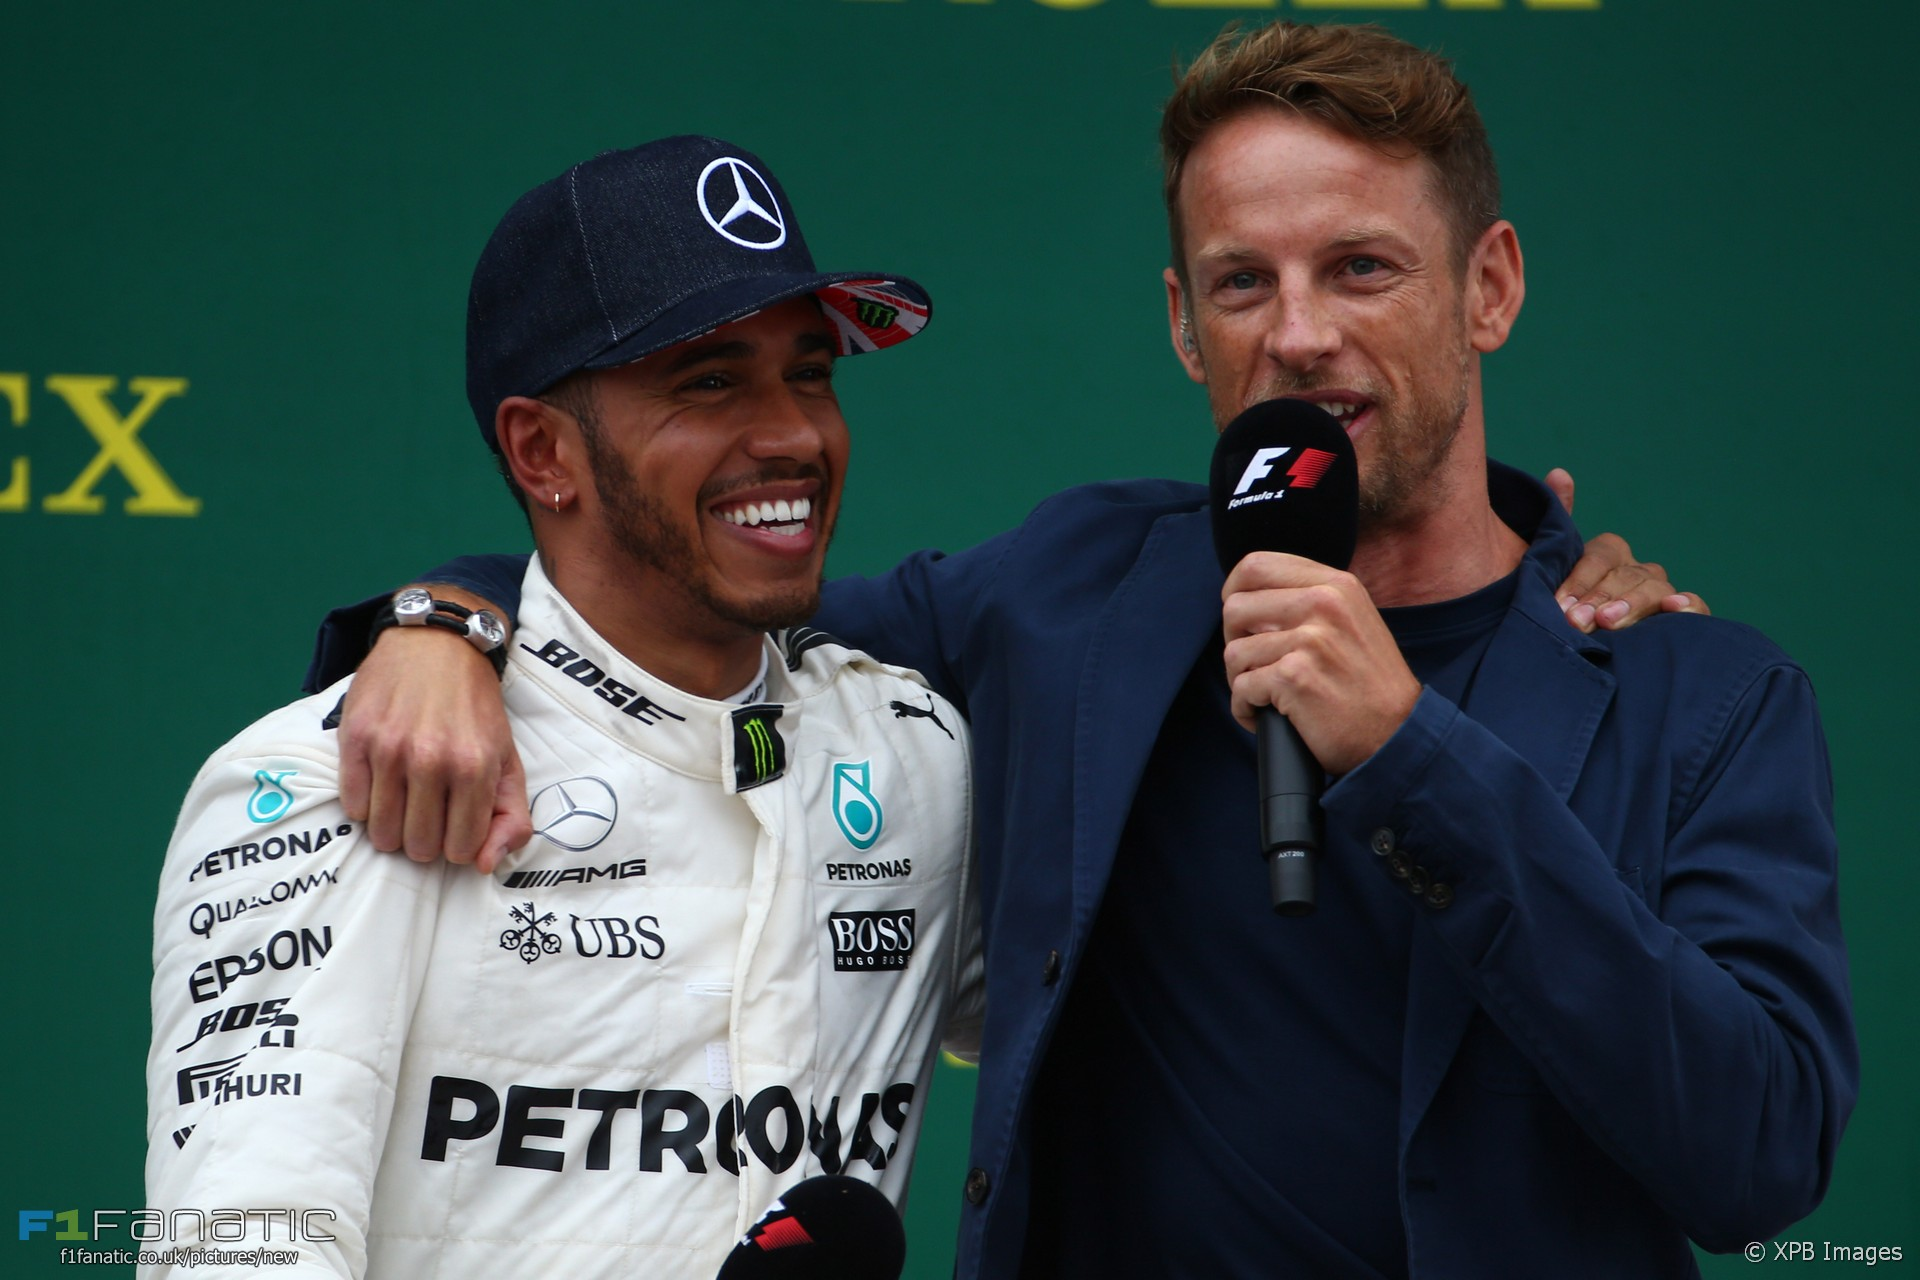 Lewis Hamilton, Jenson Button, Silverstone, 2017